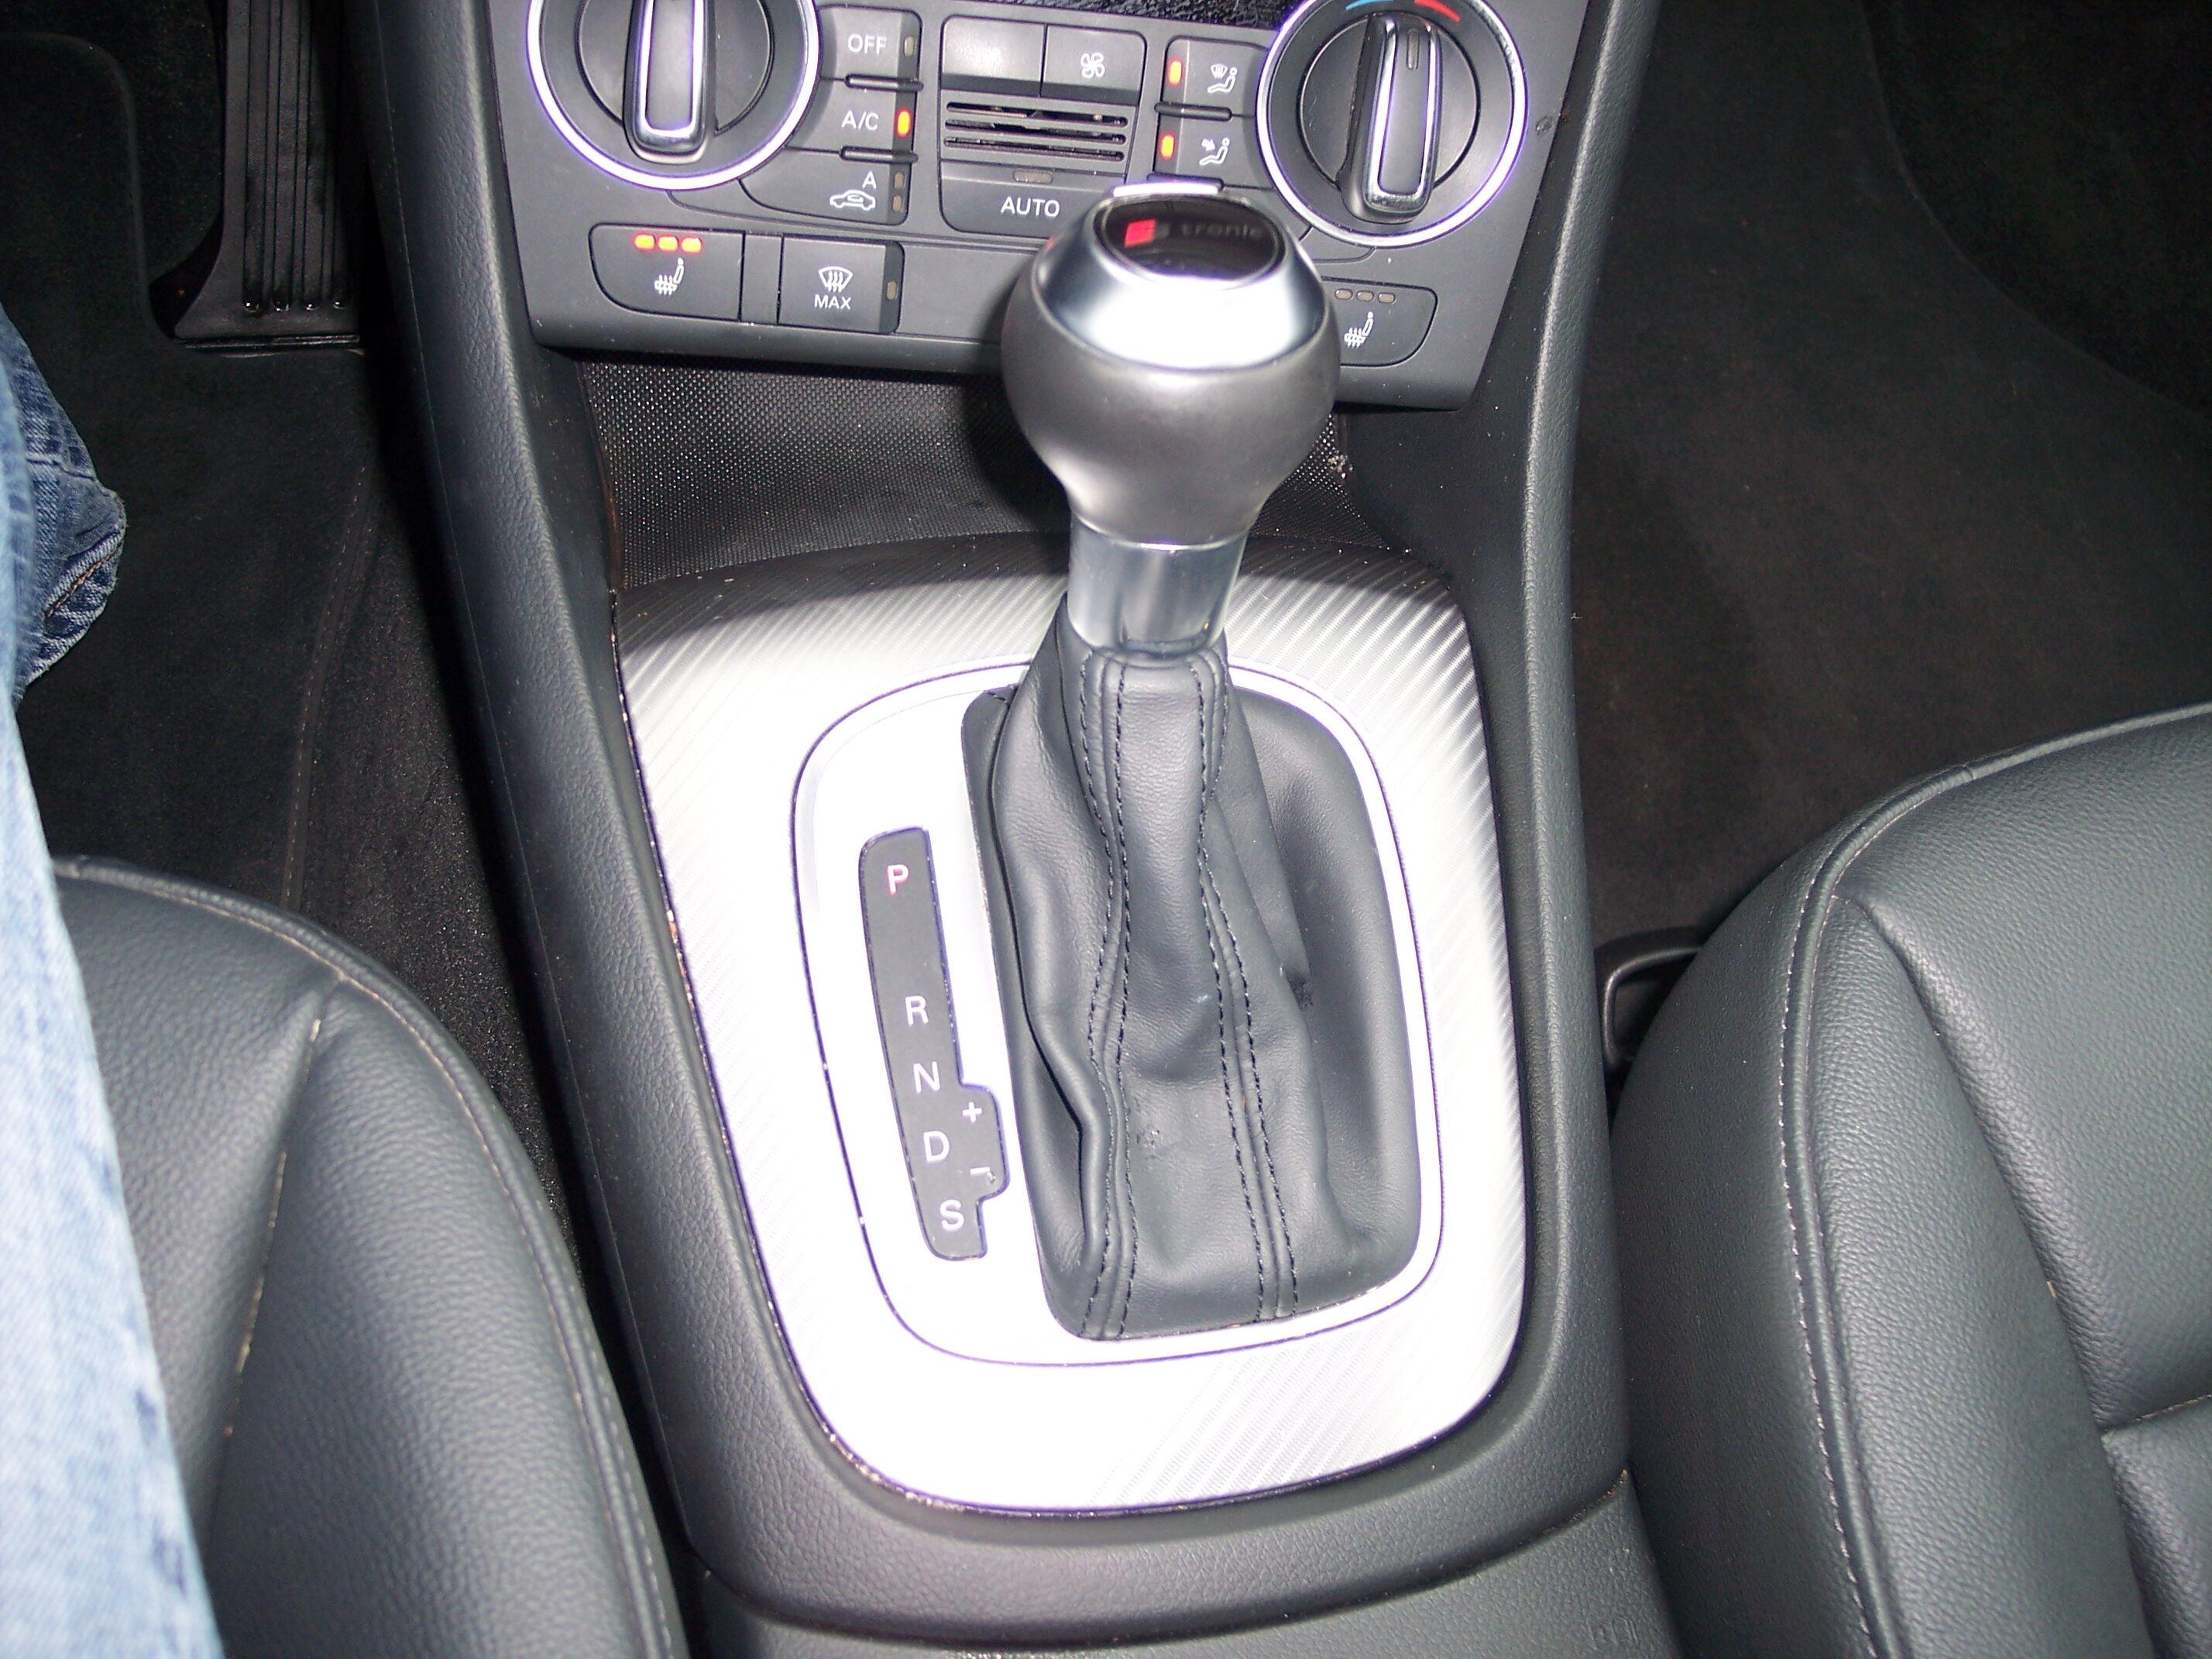 Audi Q3 - 2015 SUV AUTOMAAT 10/13